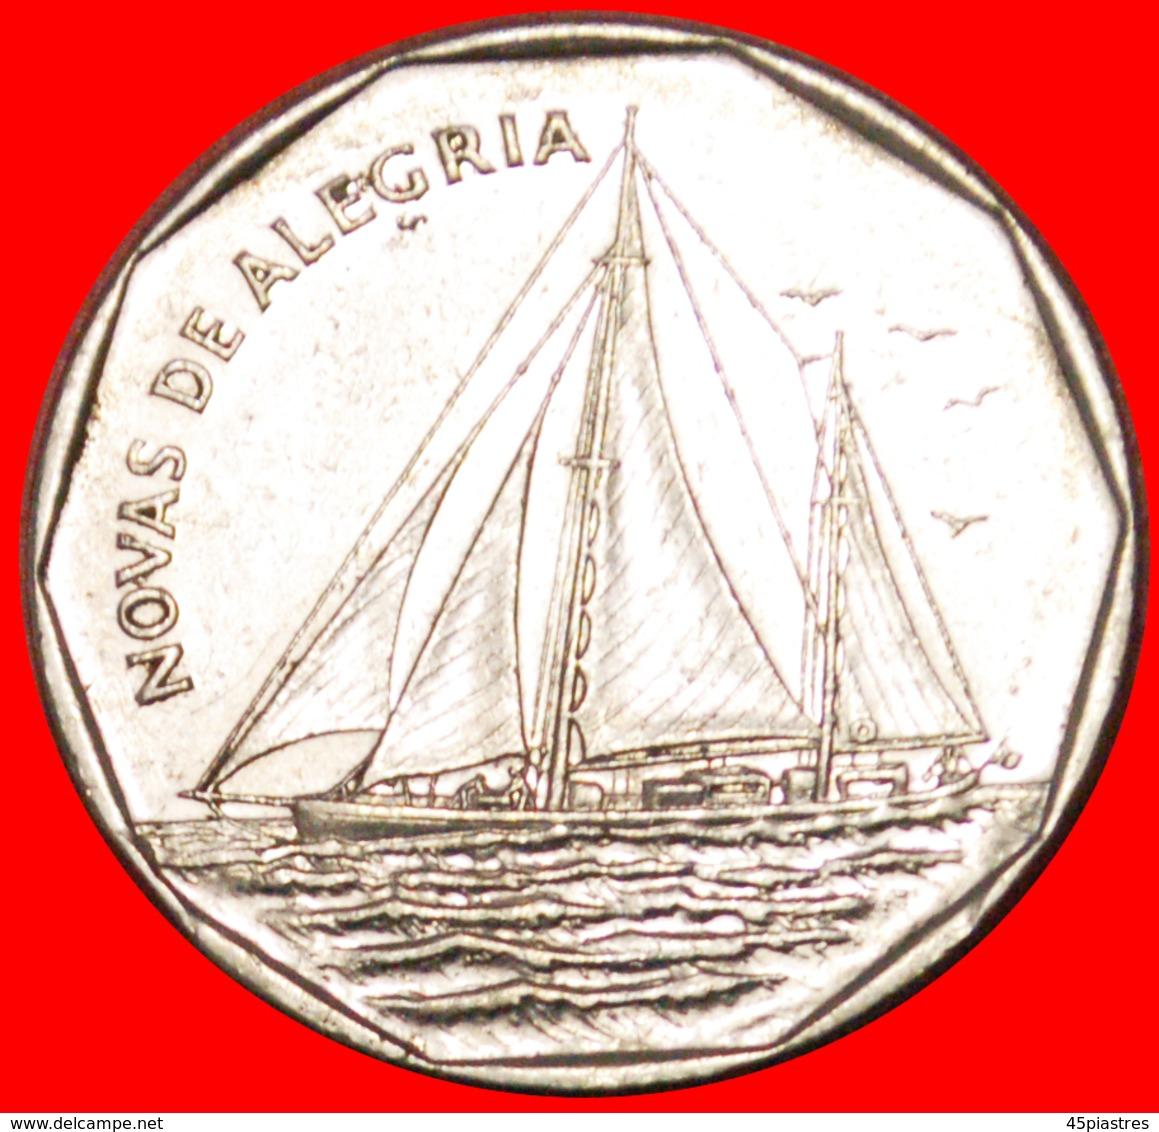 √ SHIP: CAPE VERDE ★ 20 ESCUDOS 1994! LOW START ★  NO RESERVE! - Cap Vert